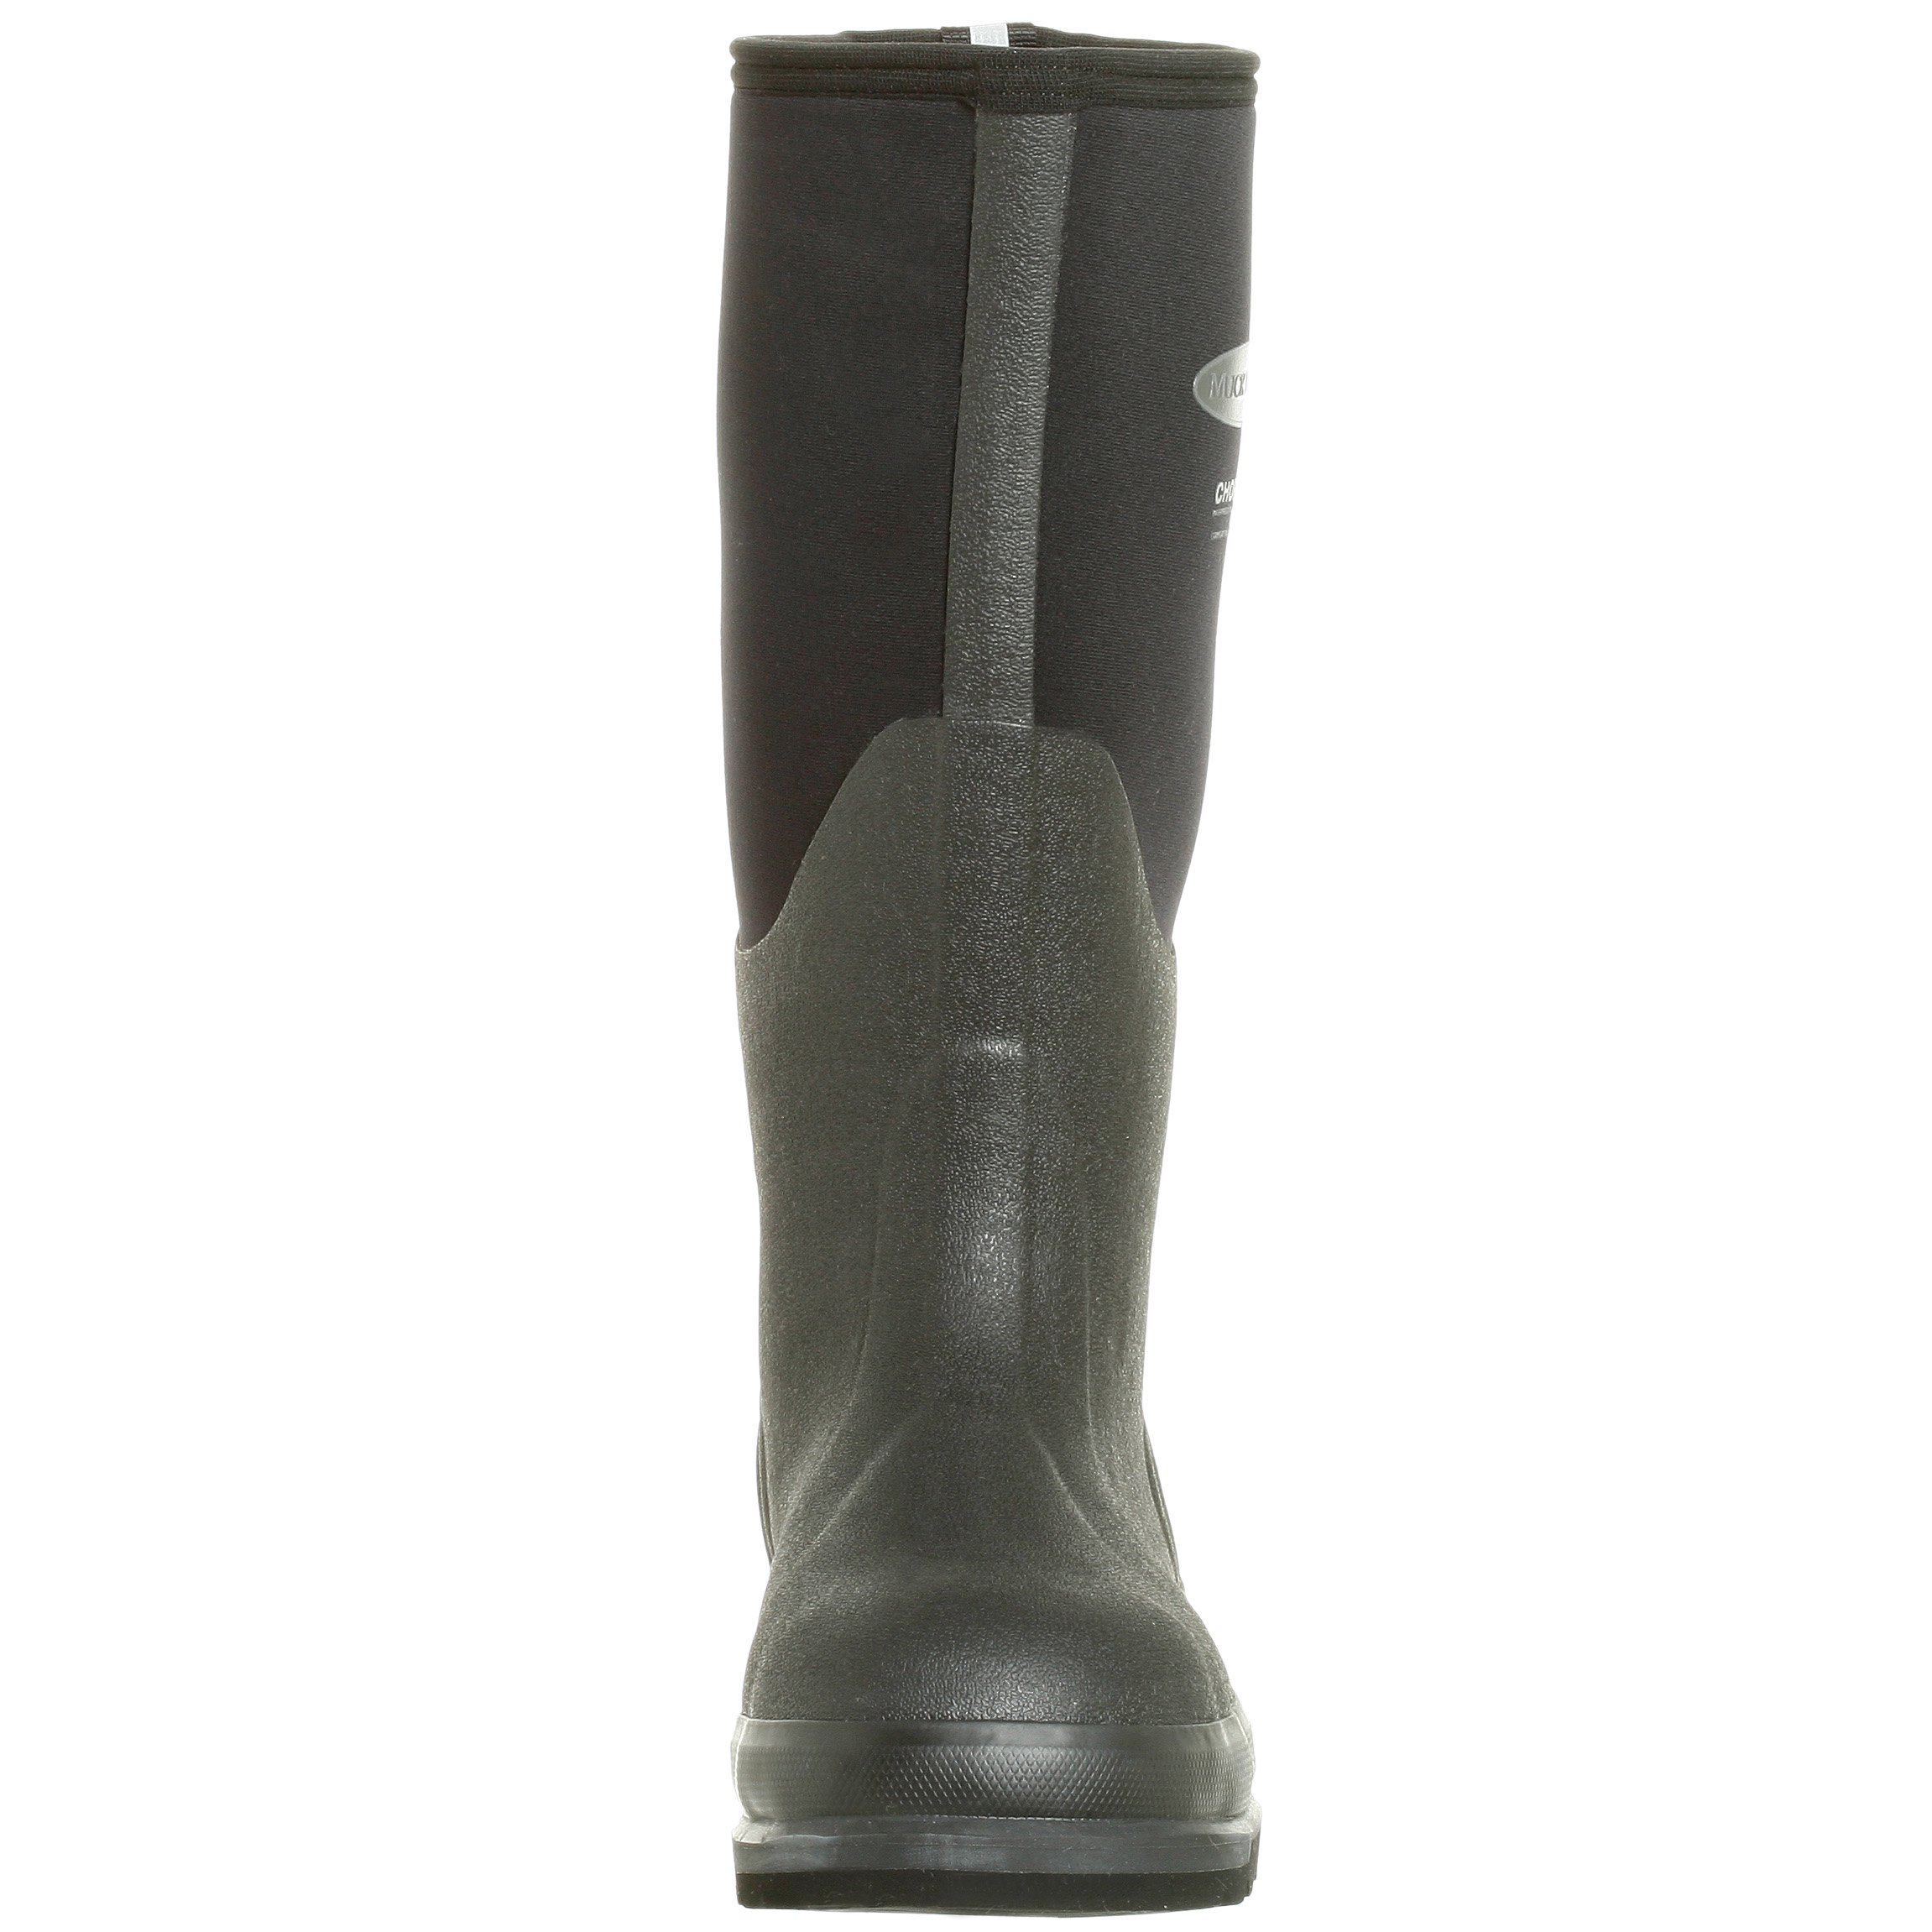 The Original MuckBoots Adult Chore Hi Boot Steel Toe,Black,Men's 12 M/Women's 13 M by Muck Boot (Image #4)